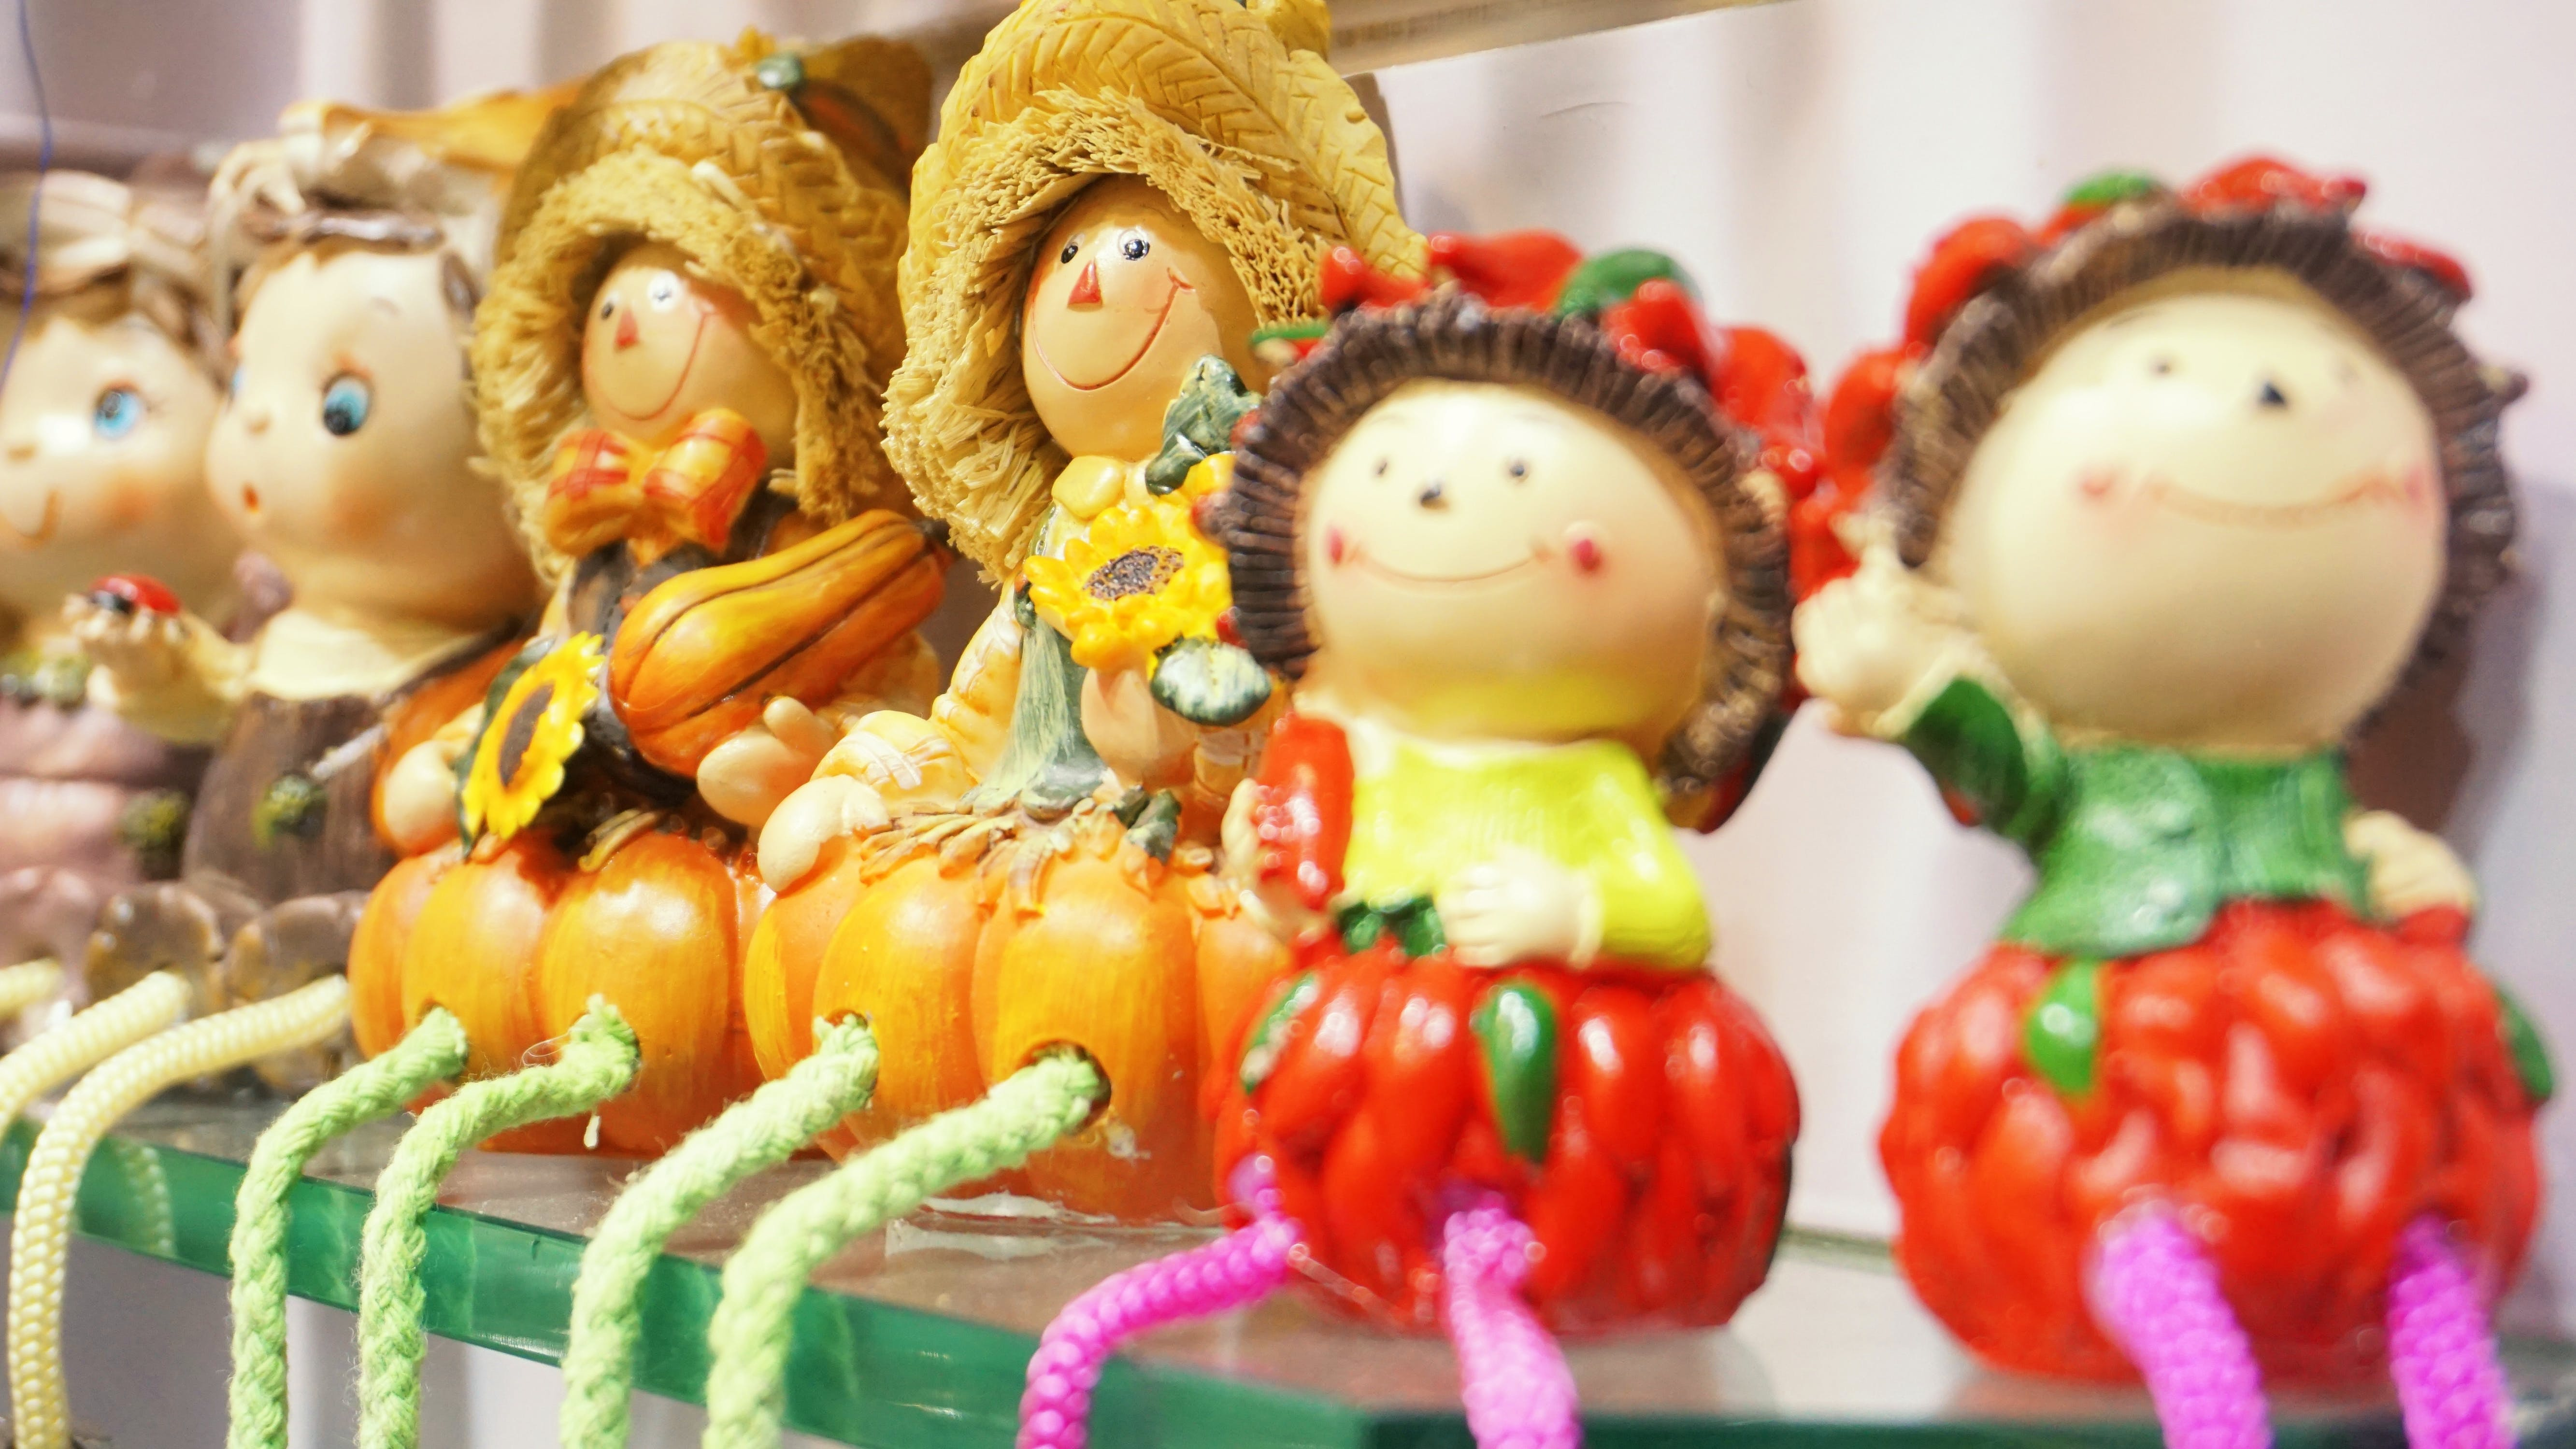 Assorted-design Dolls on Glass Wall Shelf